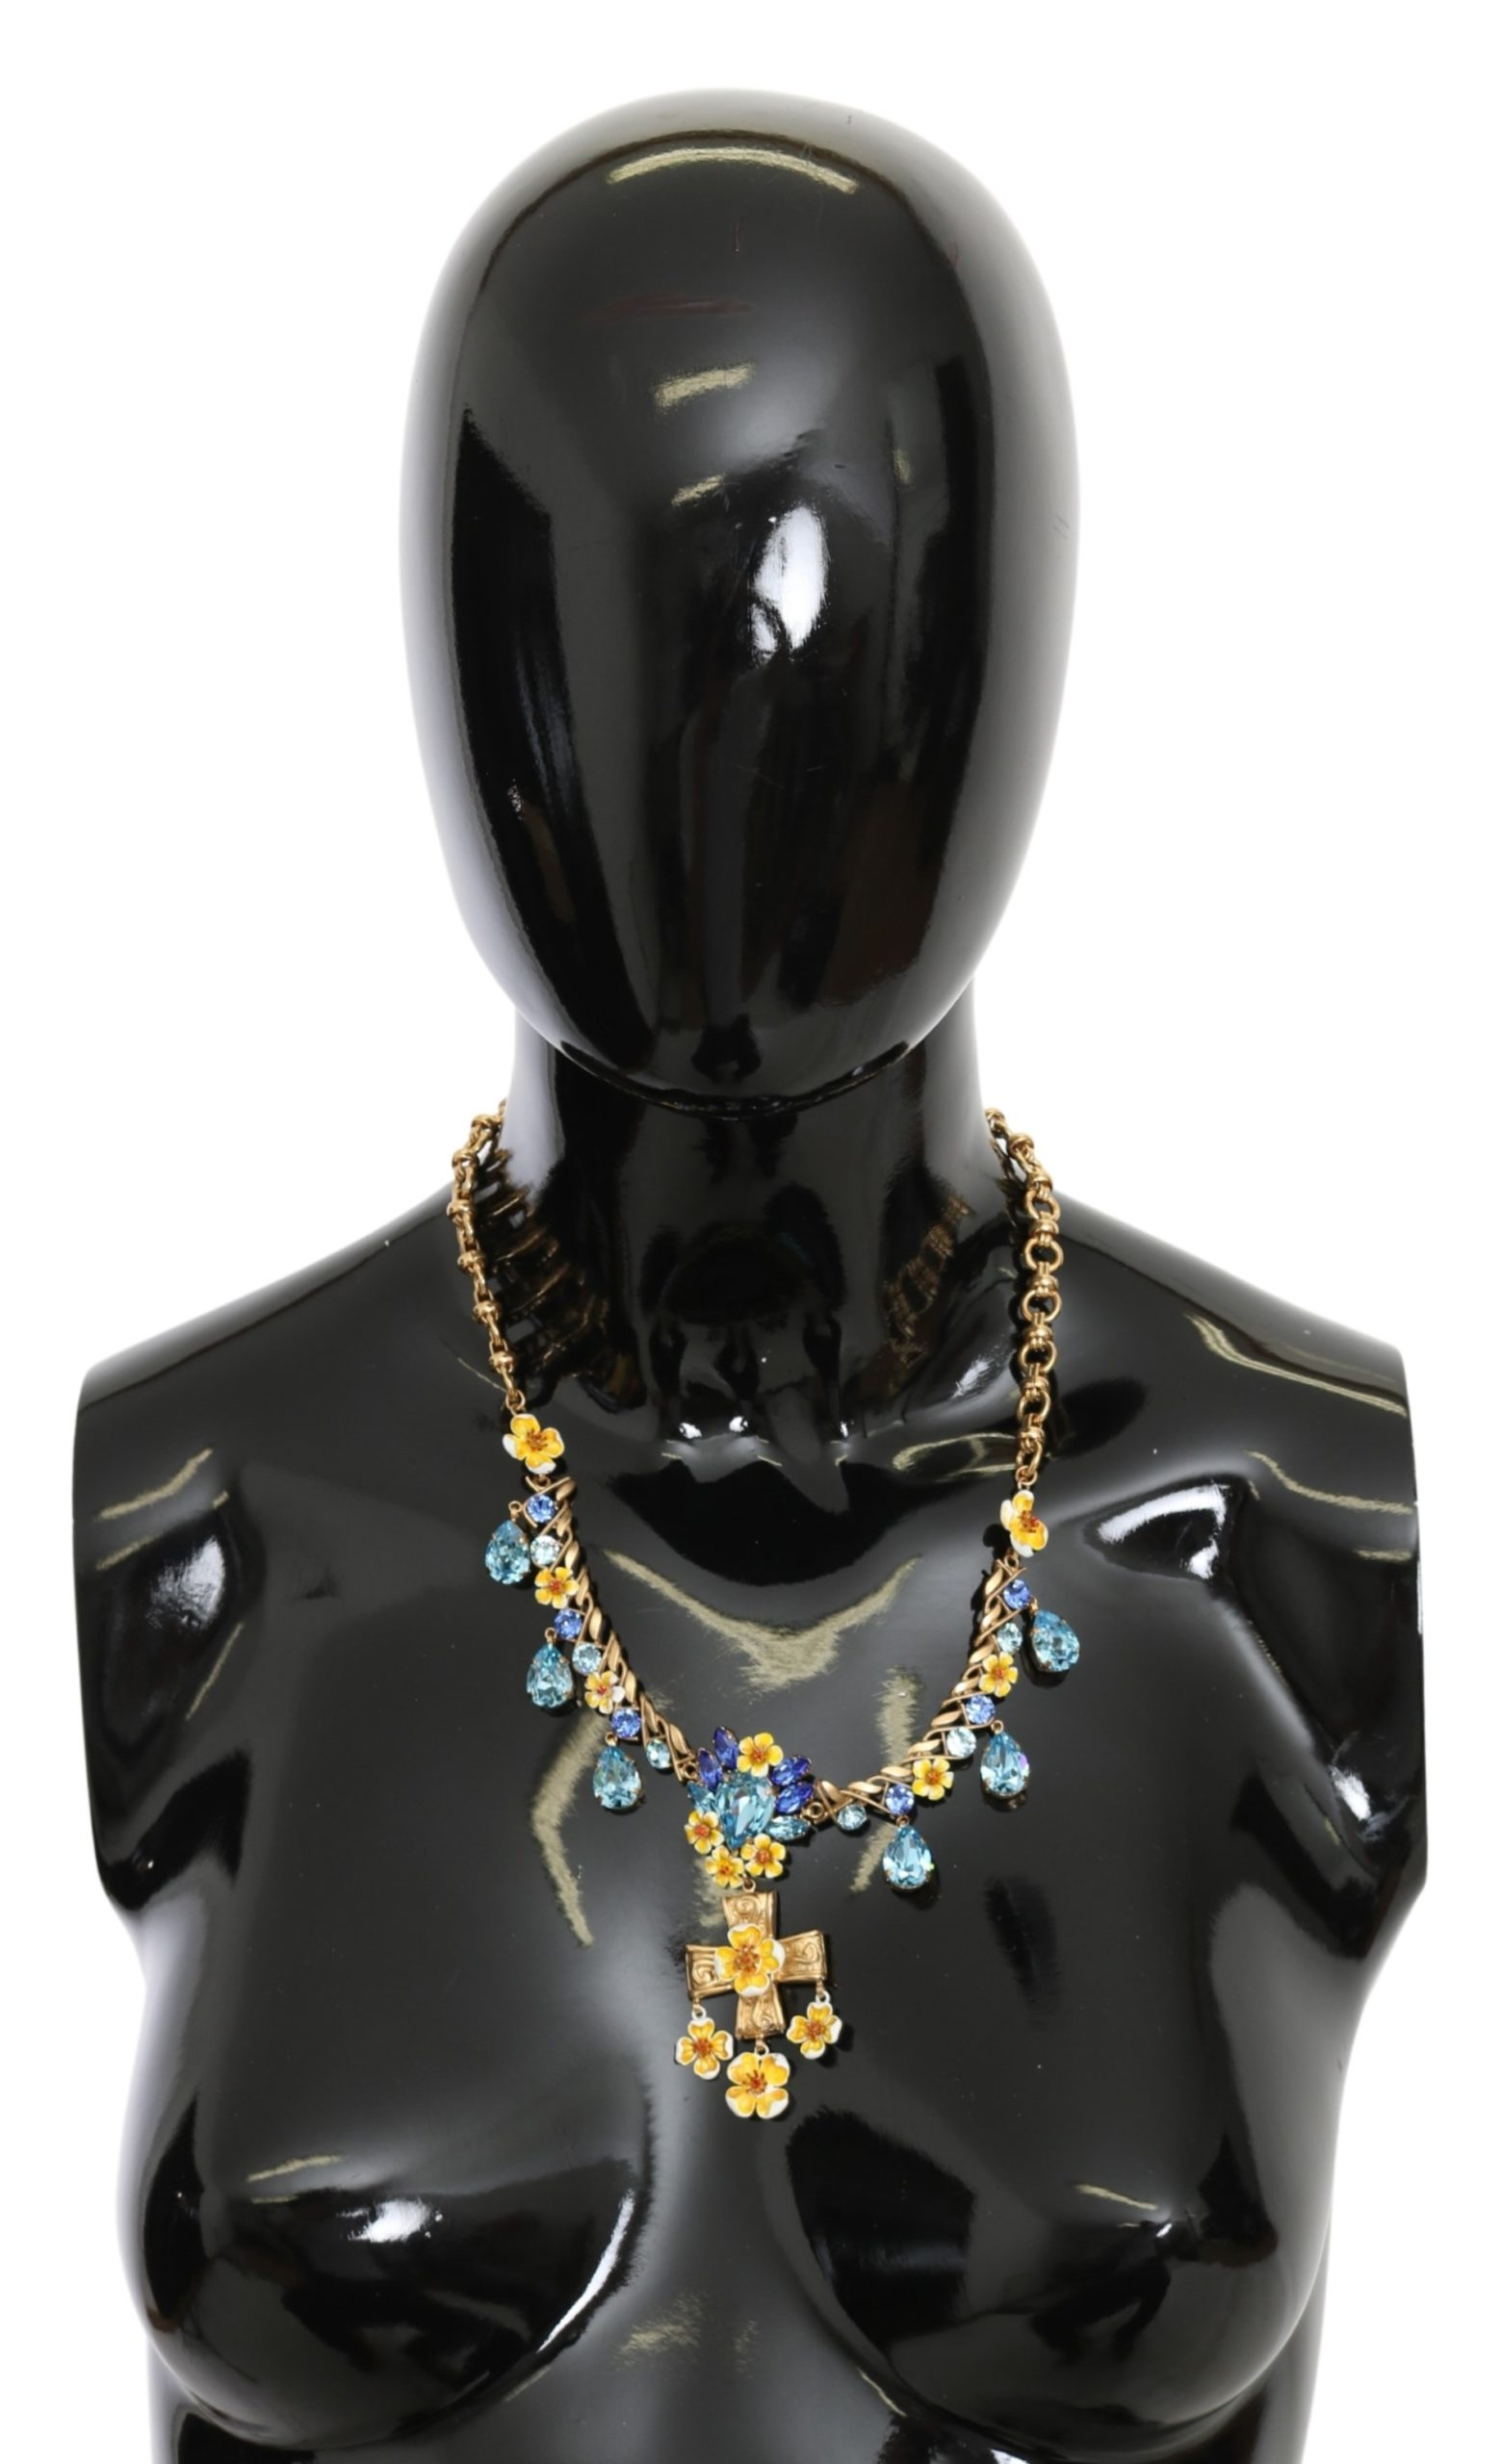 Dolce & Gabbana Women's Cross Crystal Floral Charm Necklace Blue SMY100204